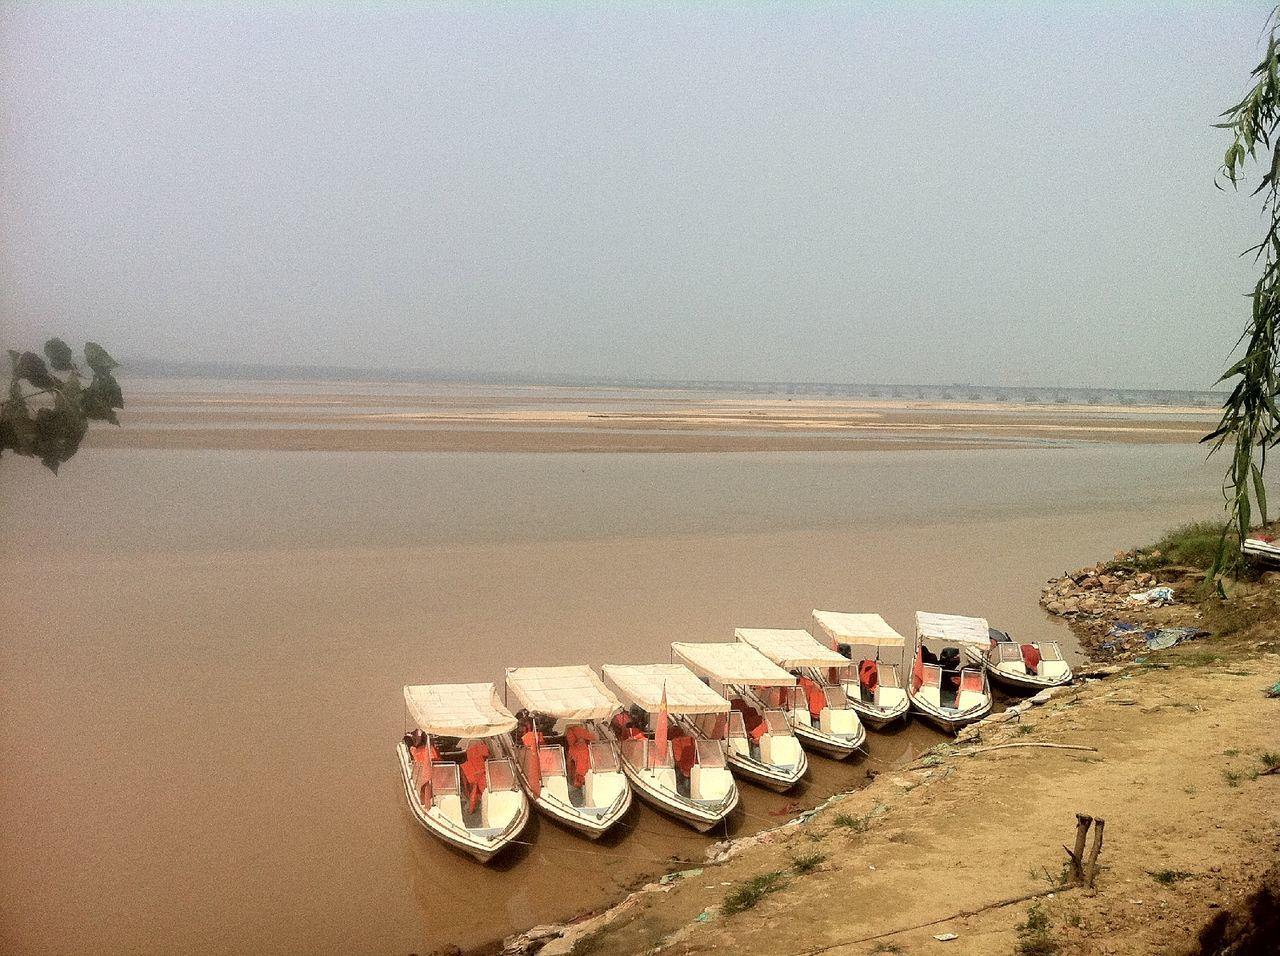 Row of boats on beach by sea